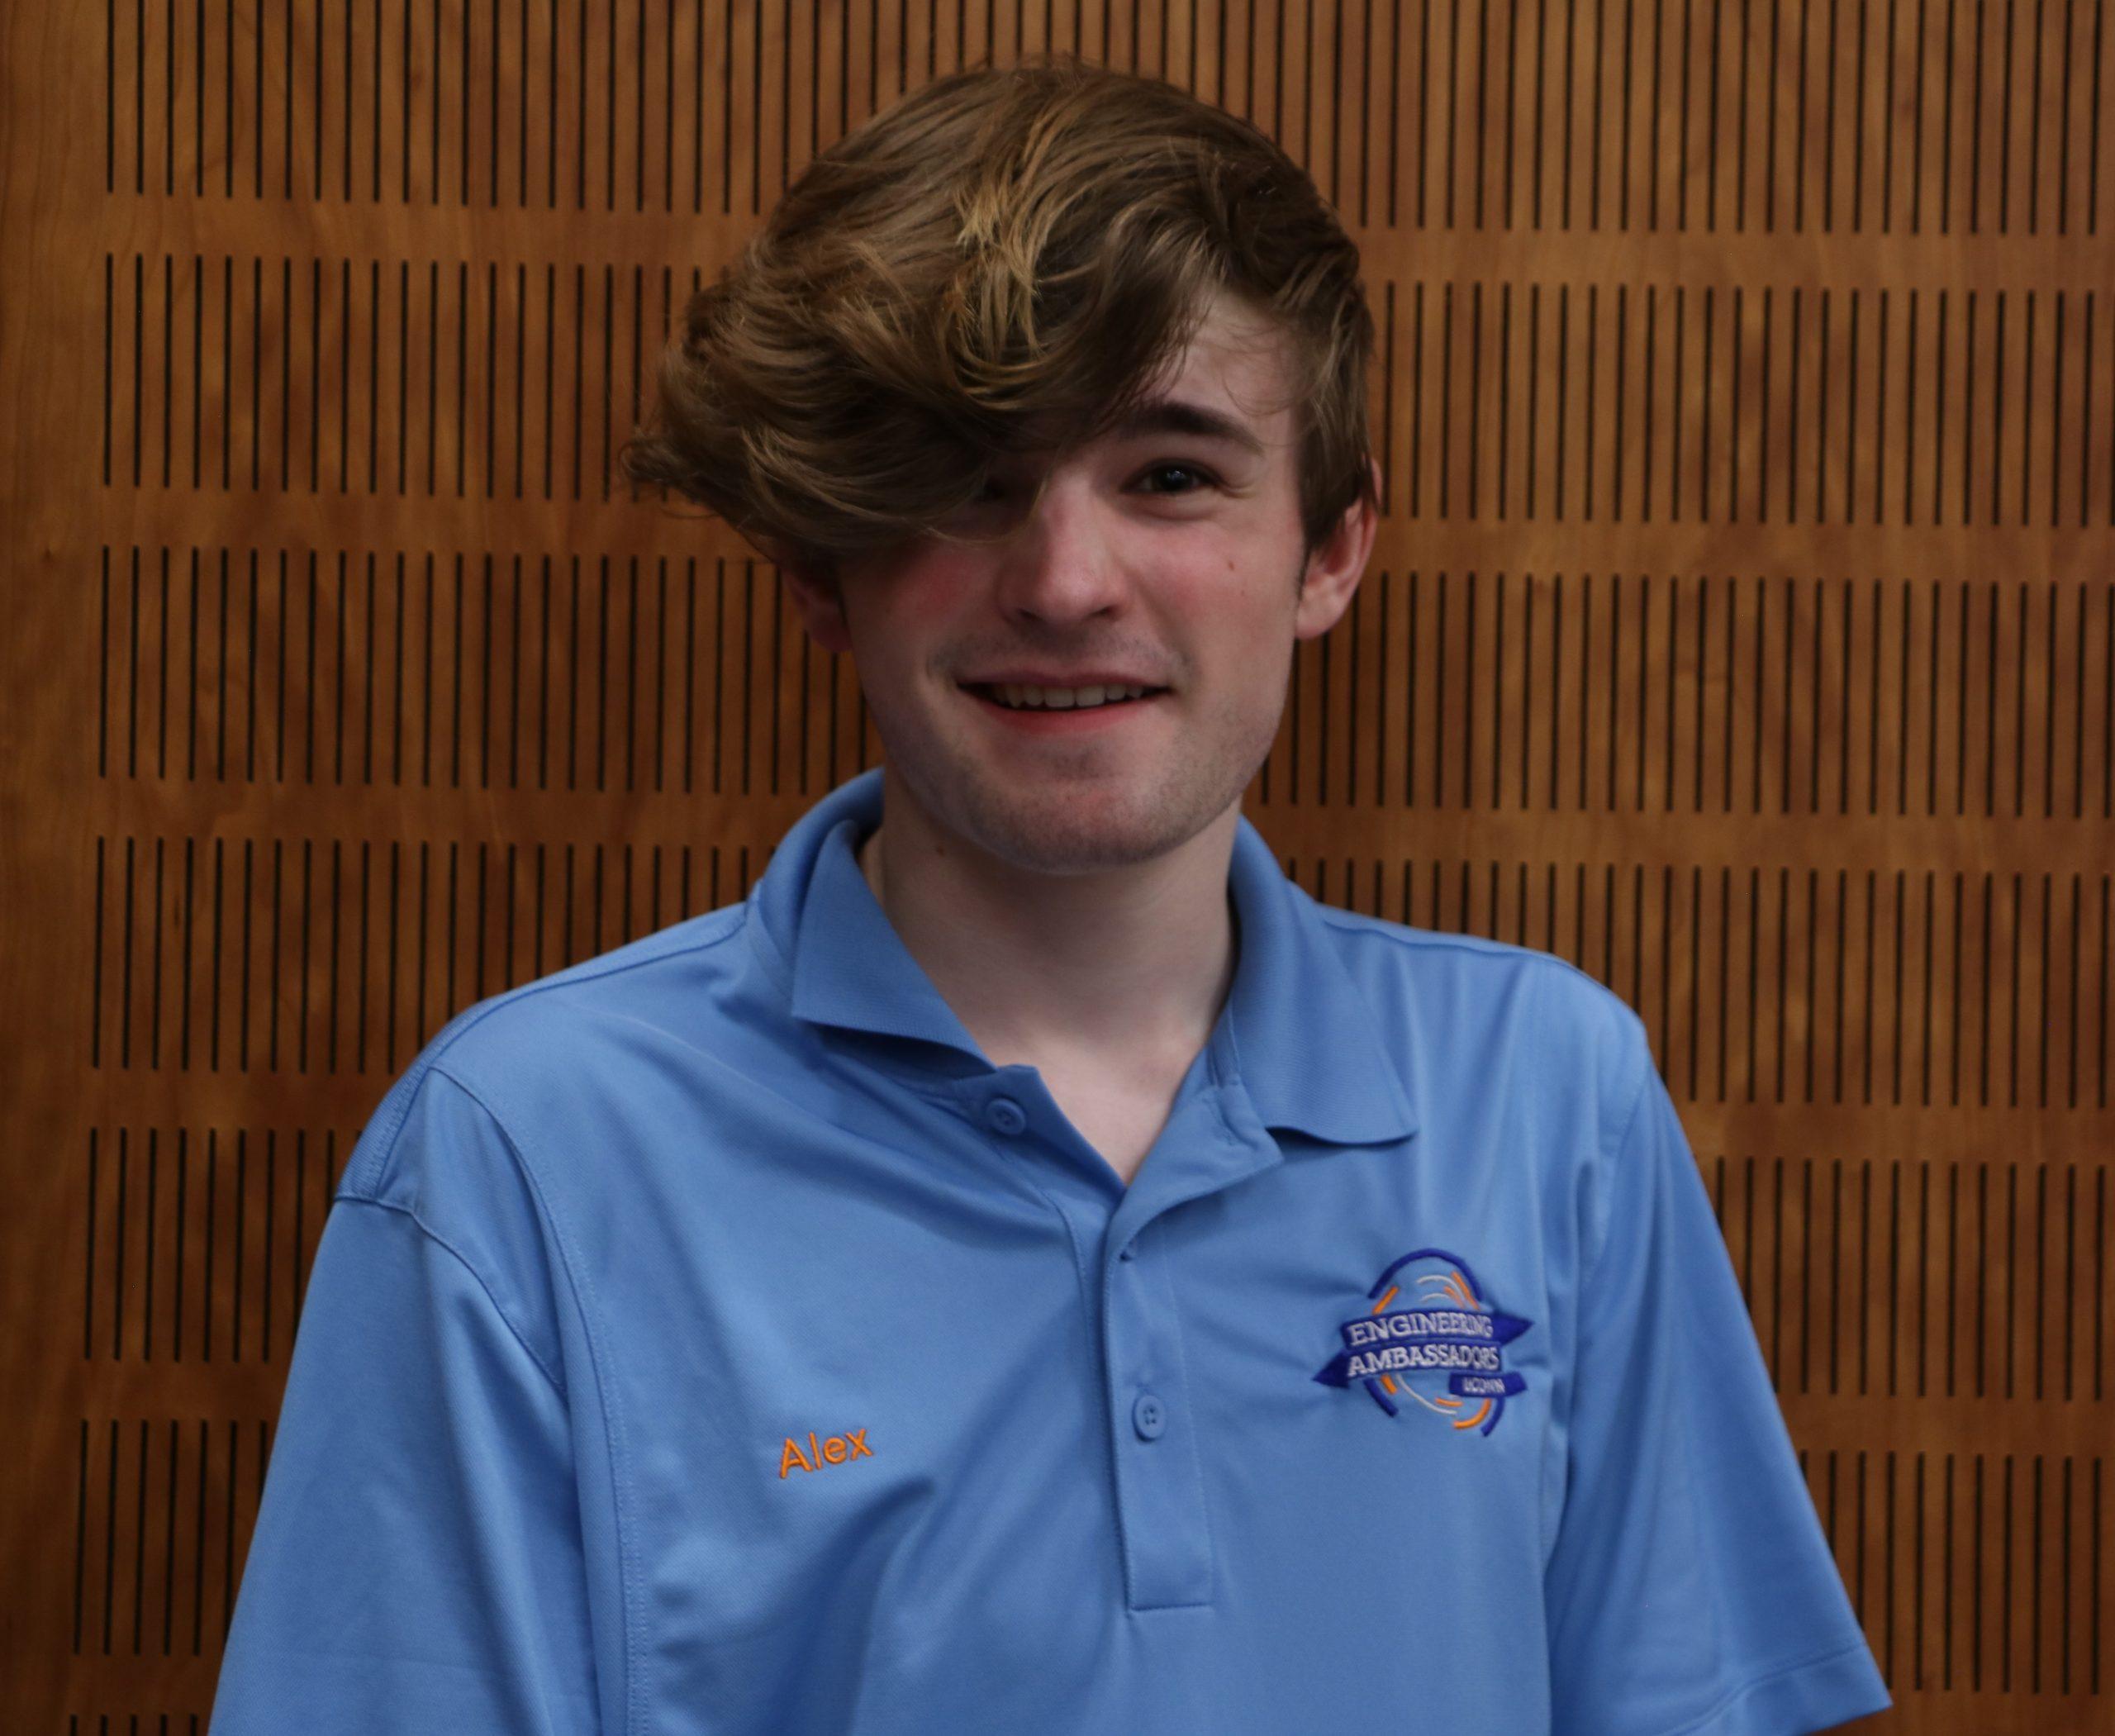 Alex Clonan